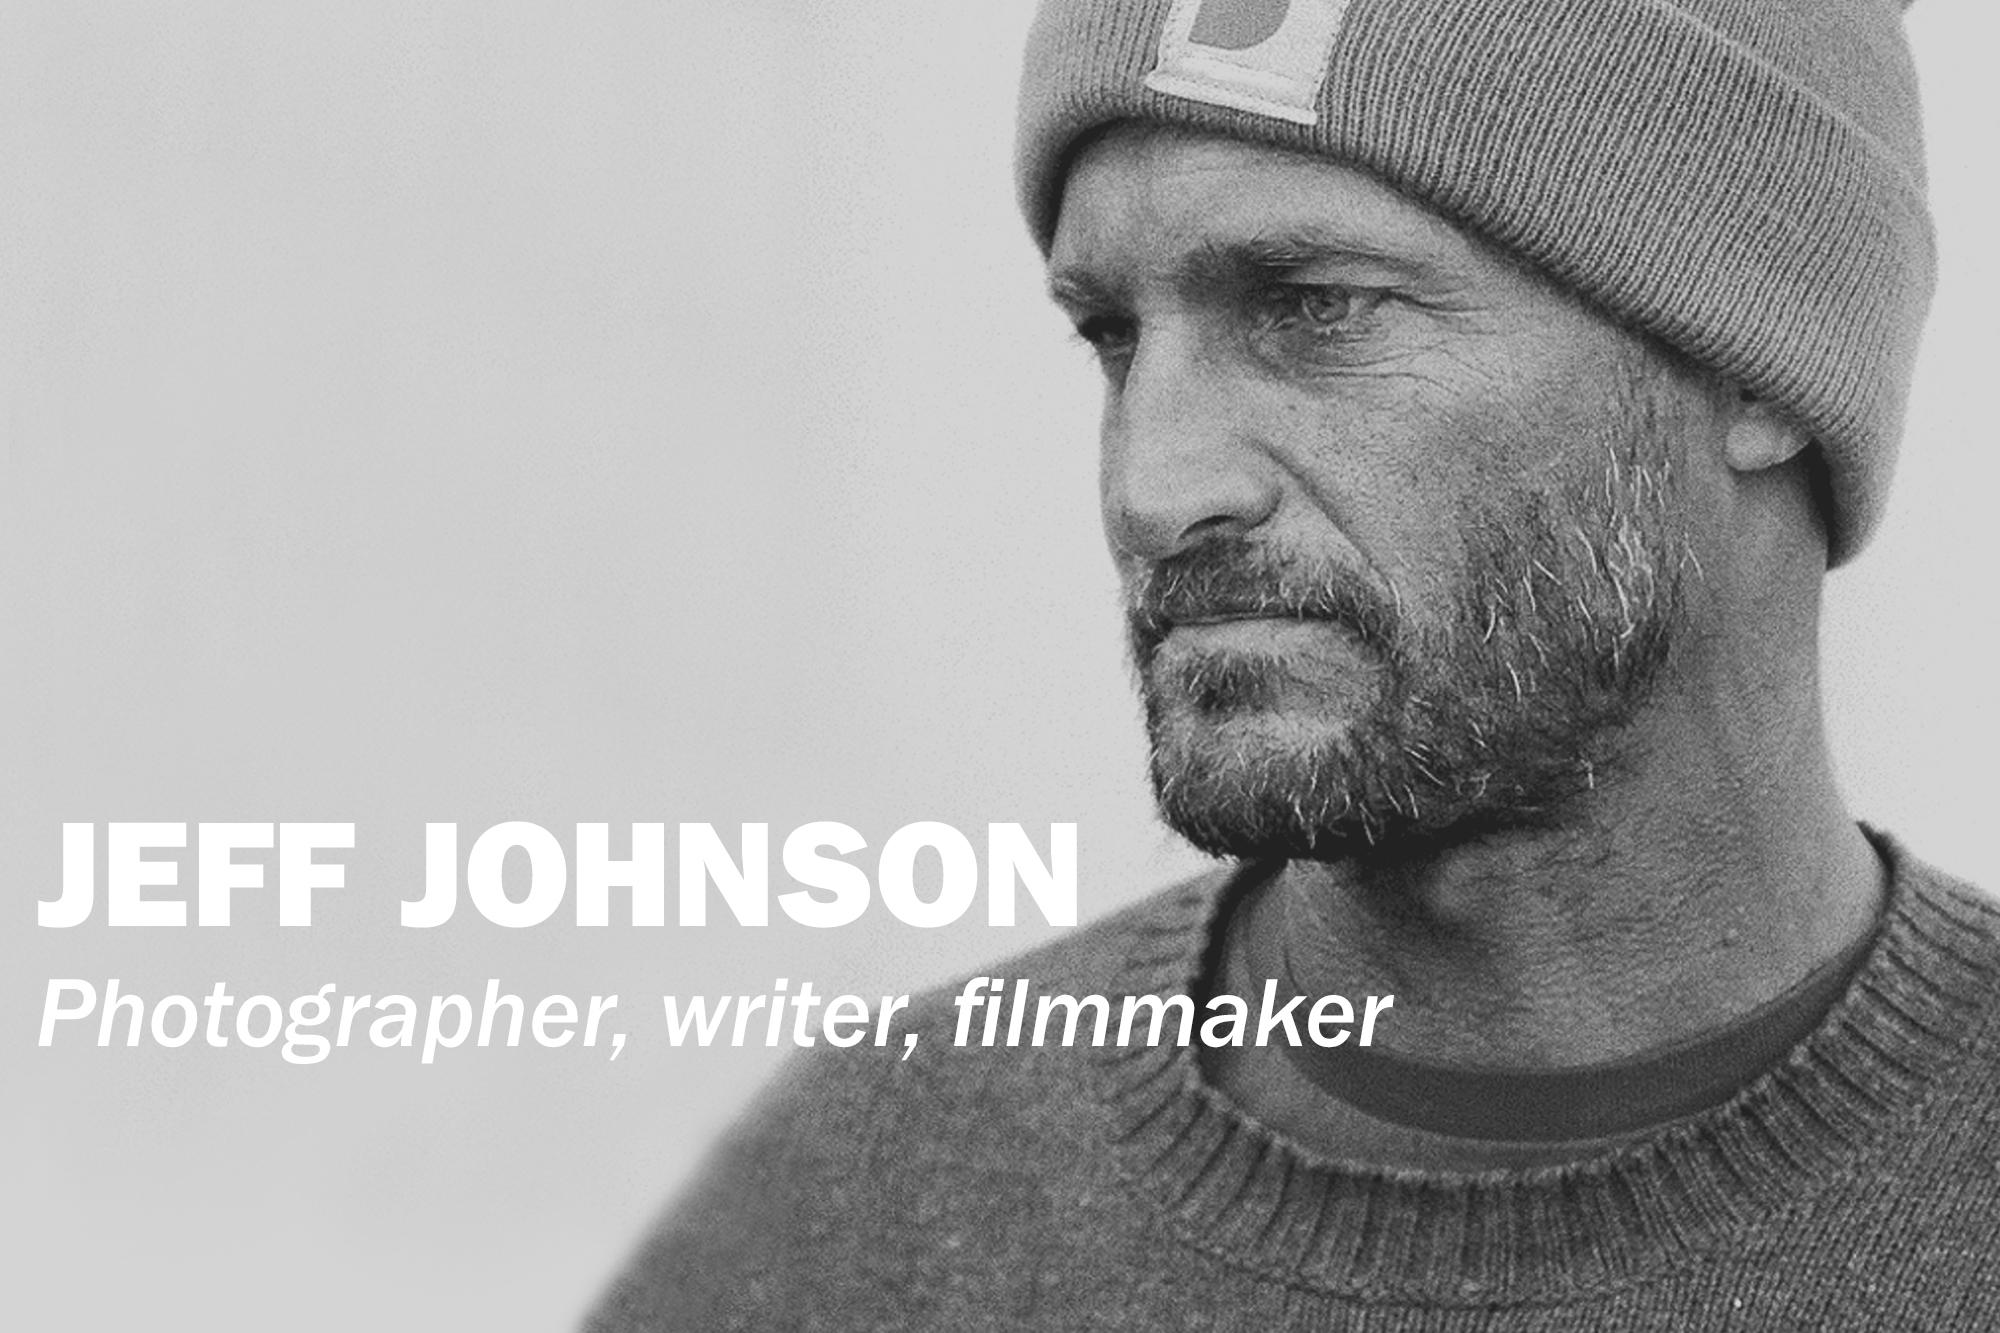 Jeff Johnson: Photographer, writer, filmmaker.